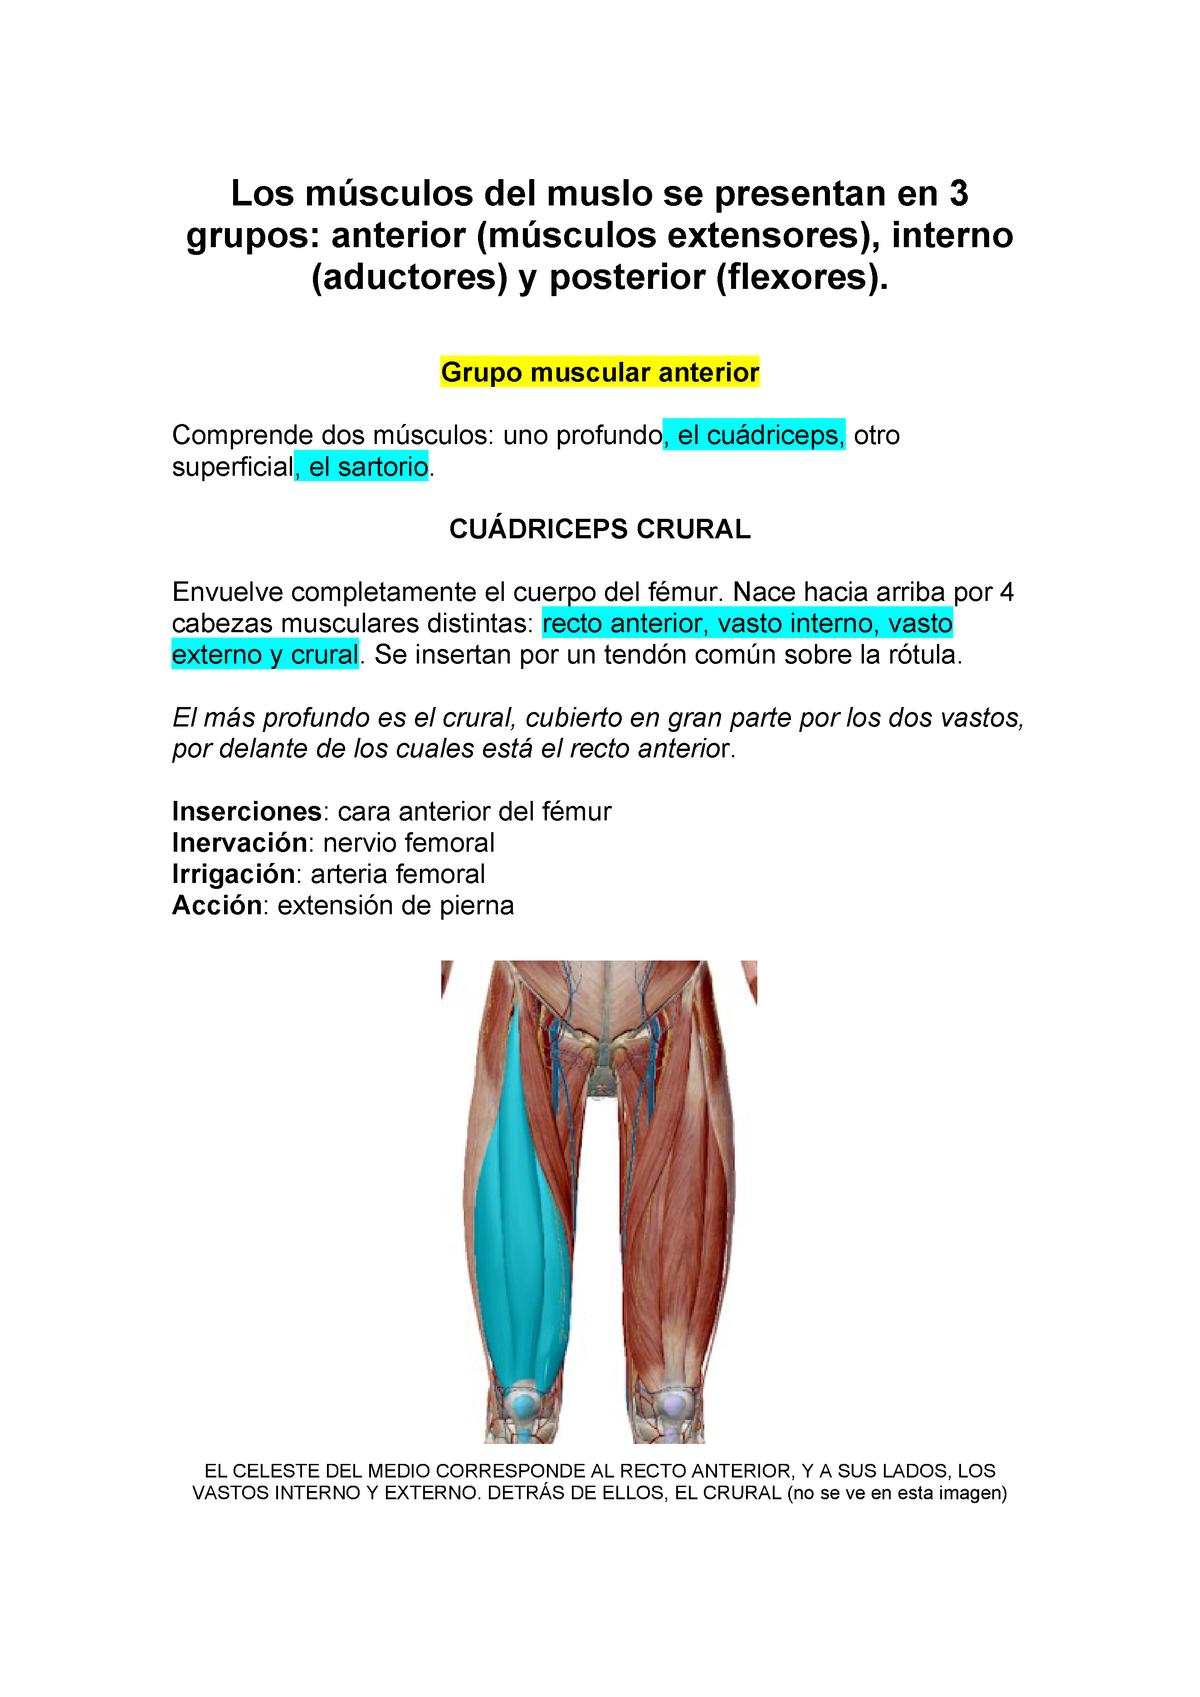 musculos del muslo grupo anterior